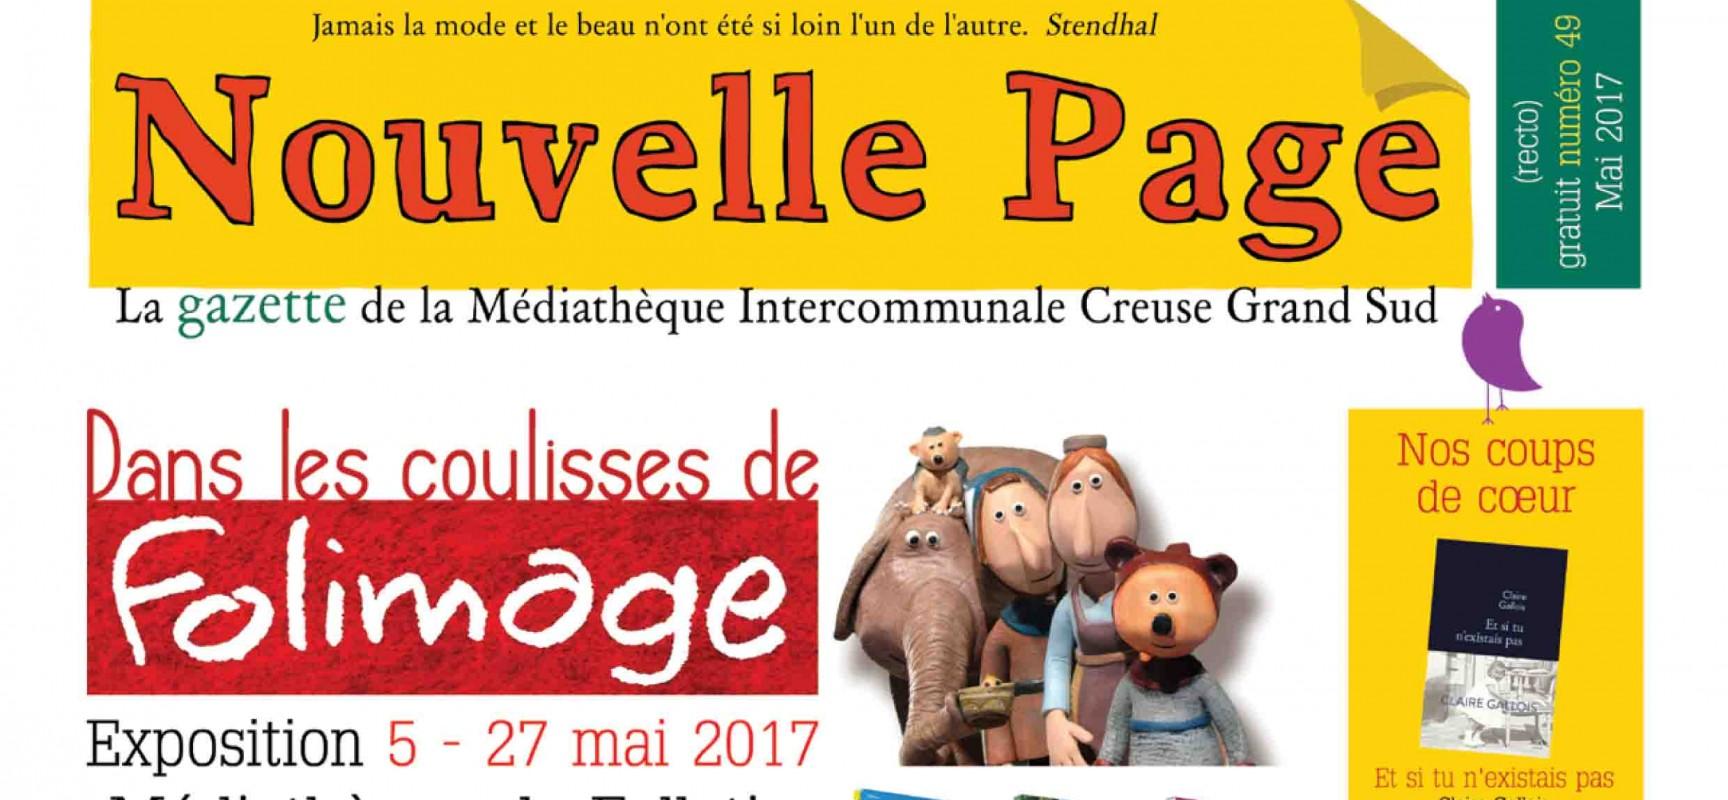 La gazette de mai de la médiathèque Creuse Grand Sud est arrivée !